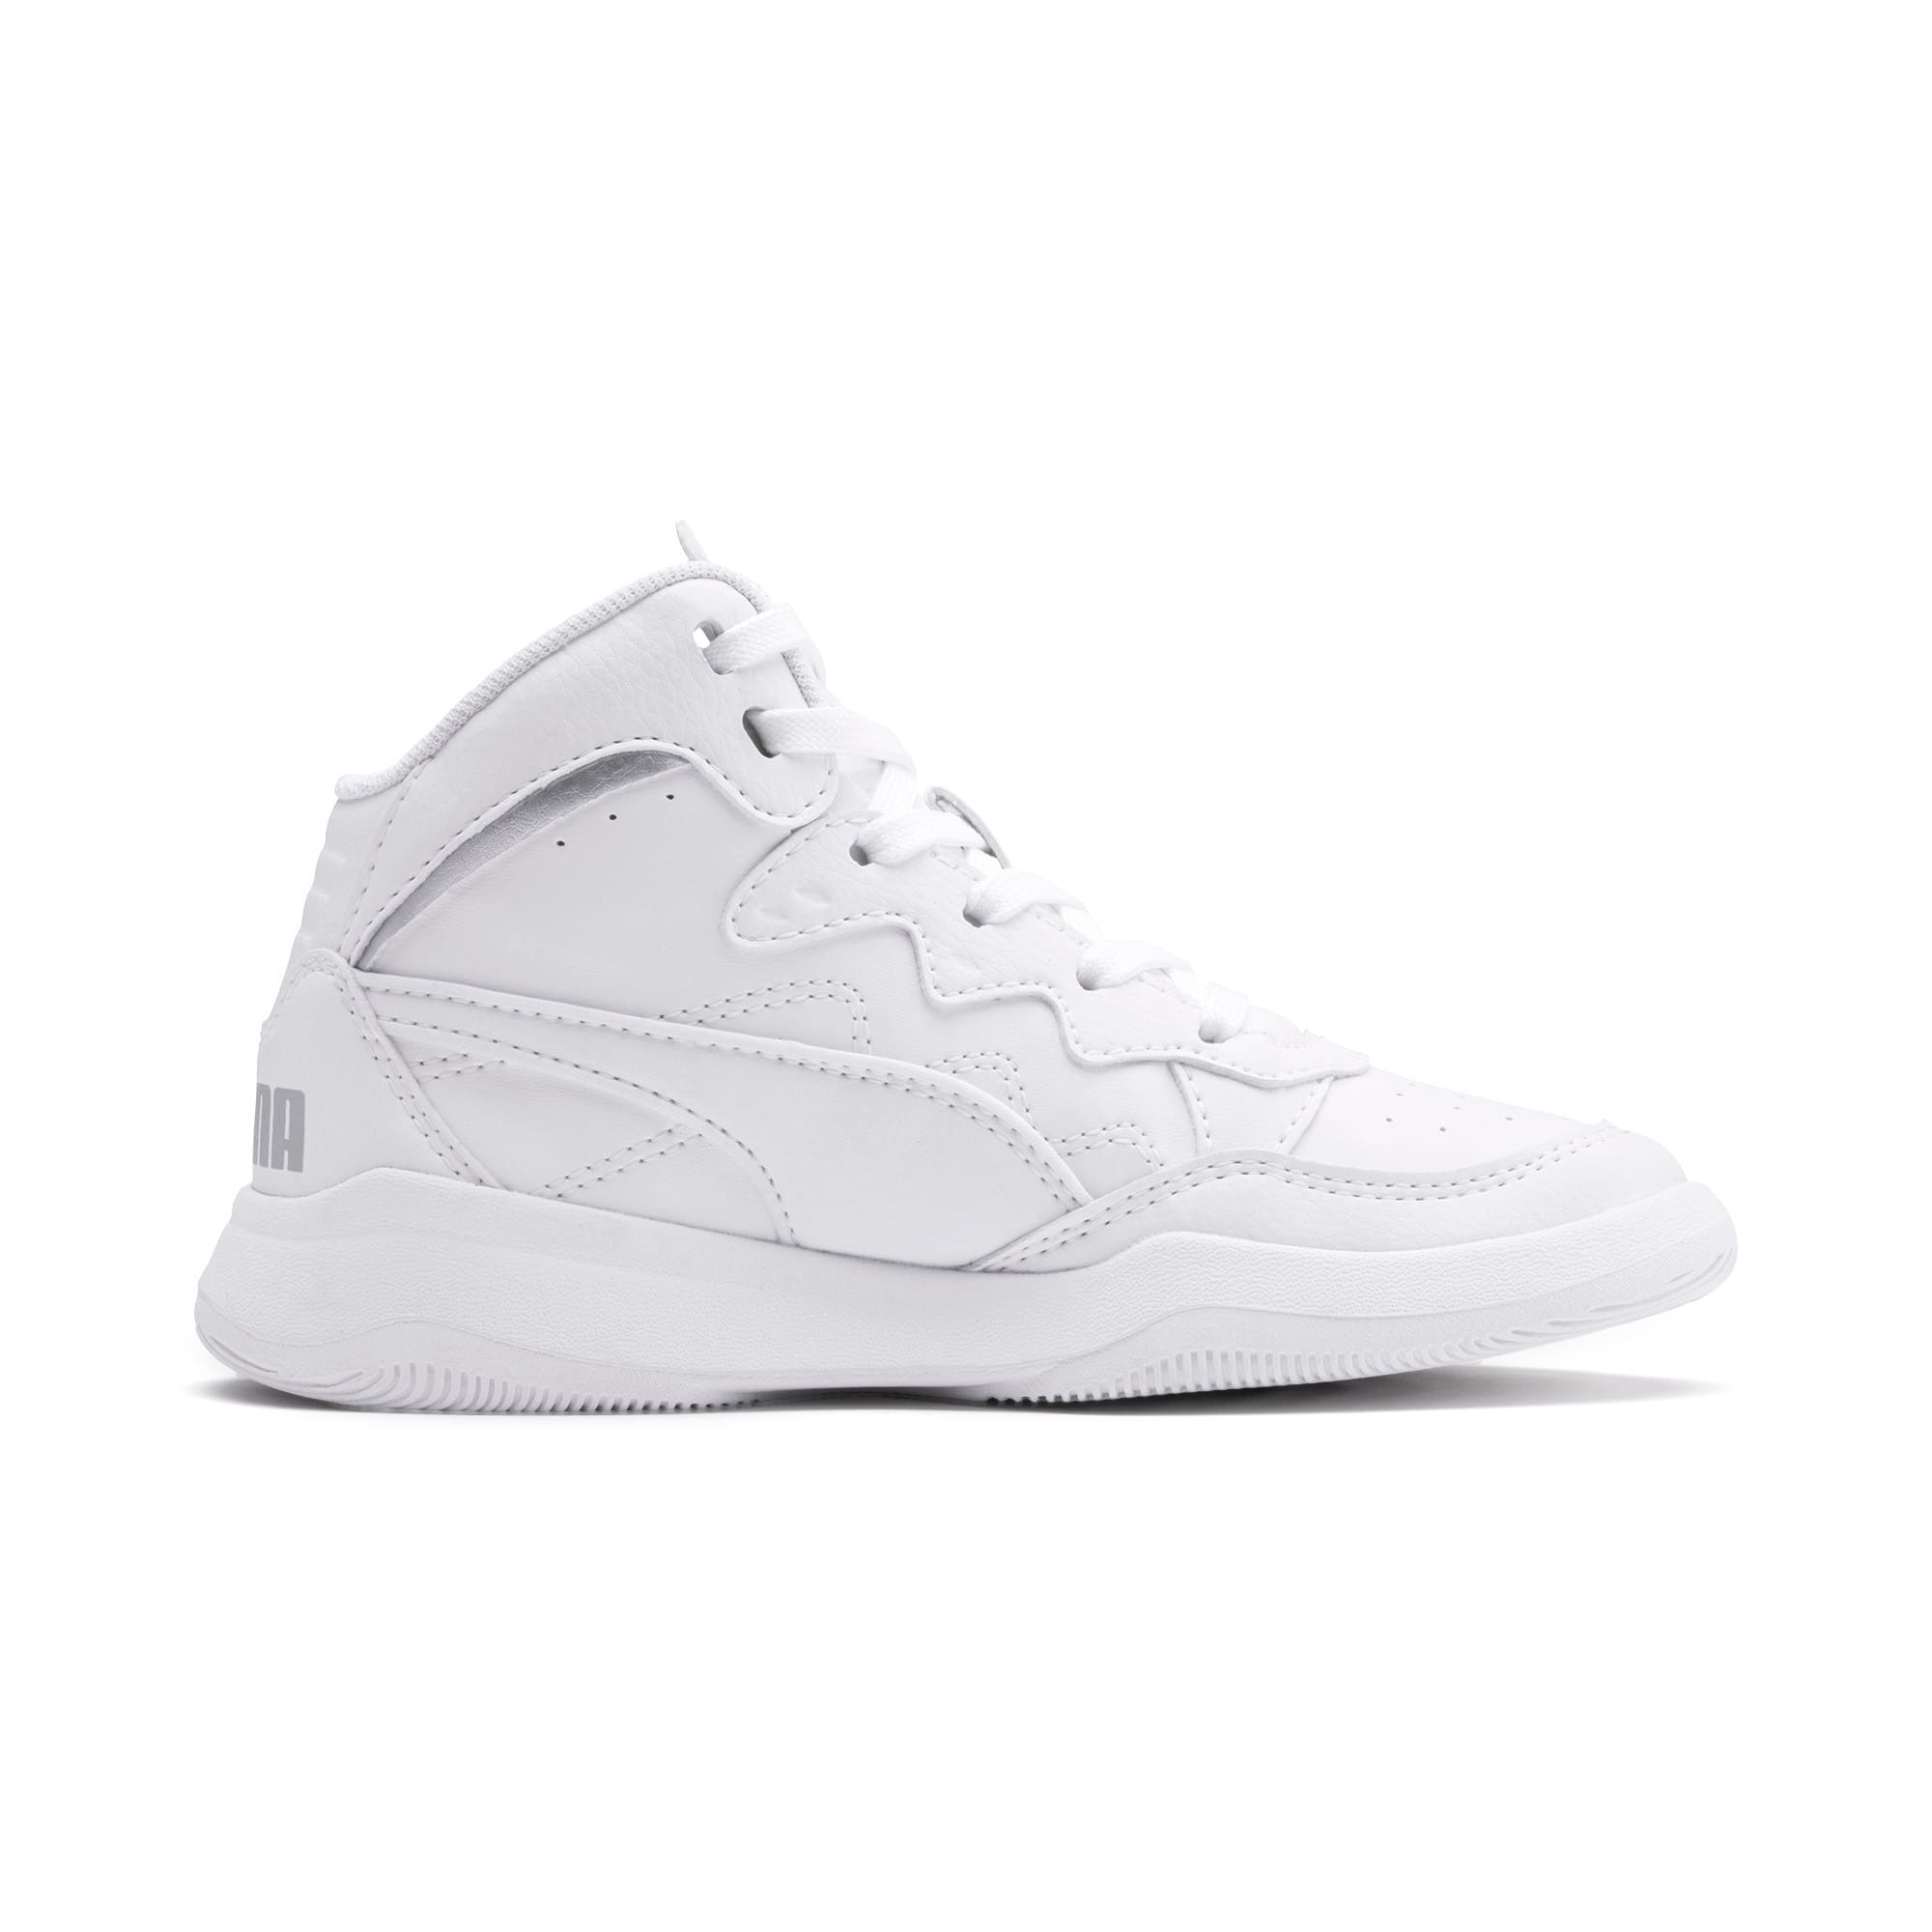 Thumbnail 5 of PUMA Rebound Playoff SL Little Kids' Shoes, Puma White-Puma Silver, medium